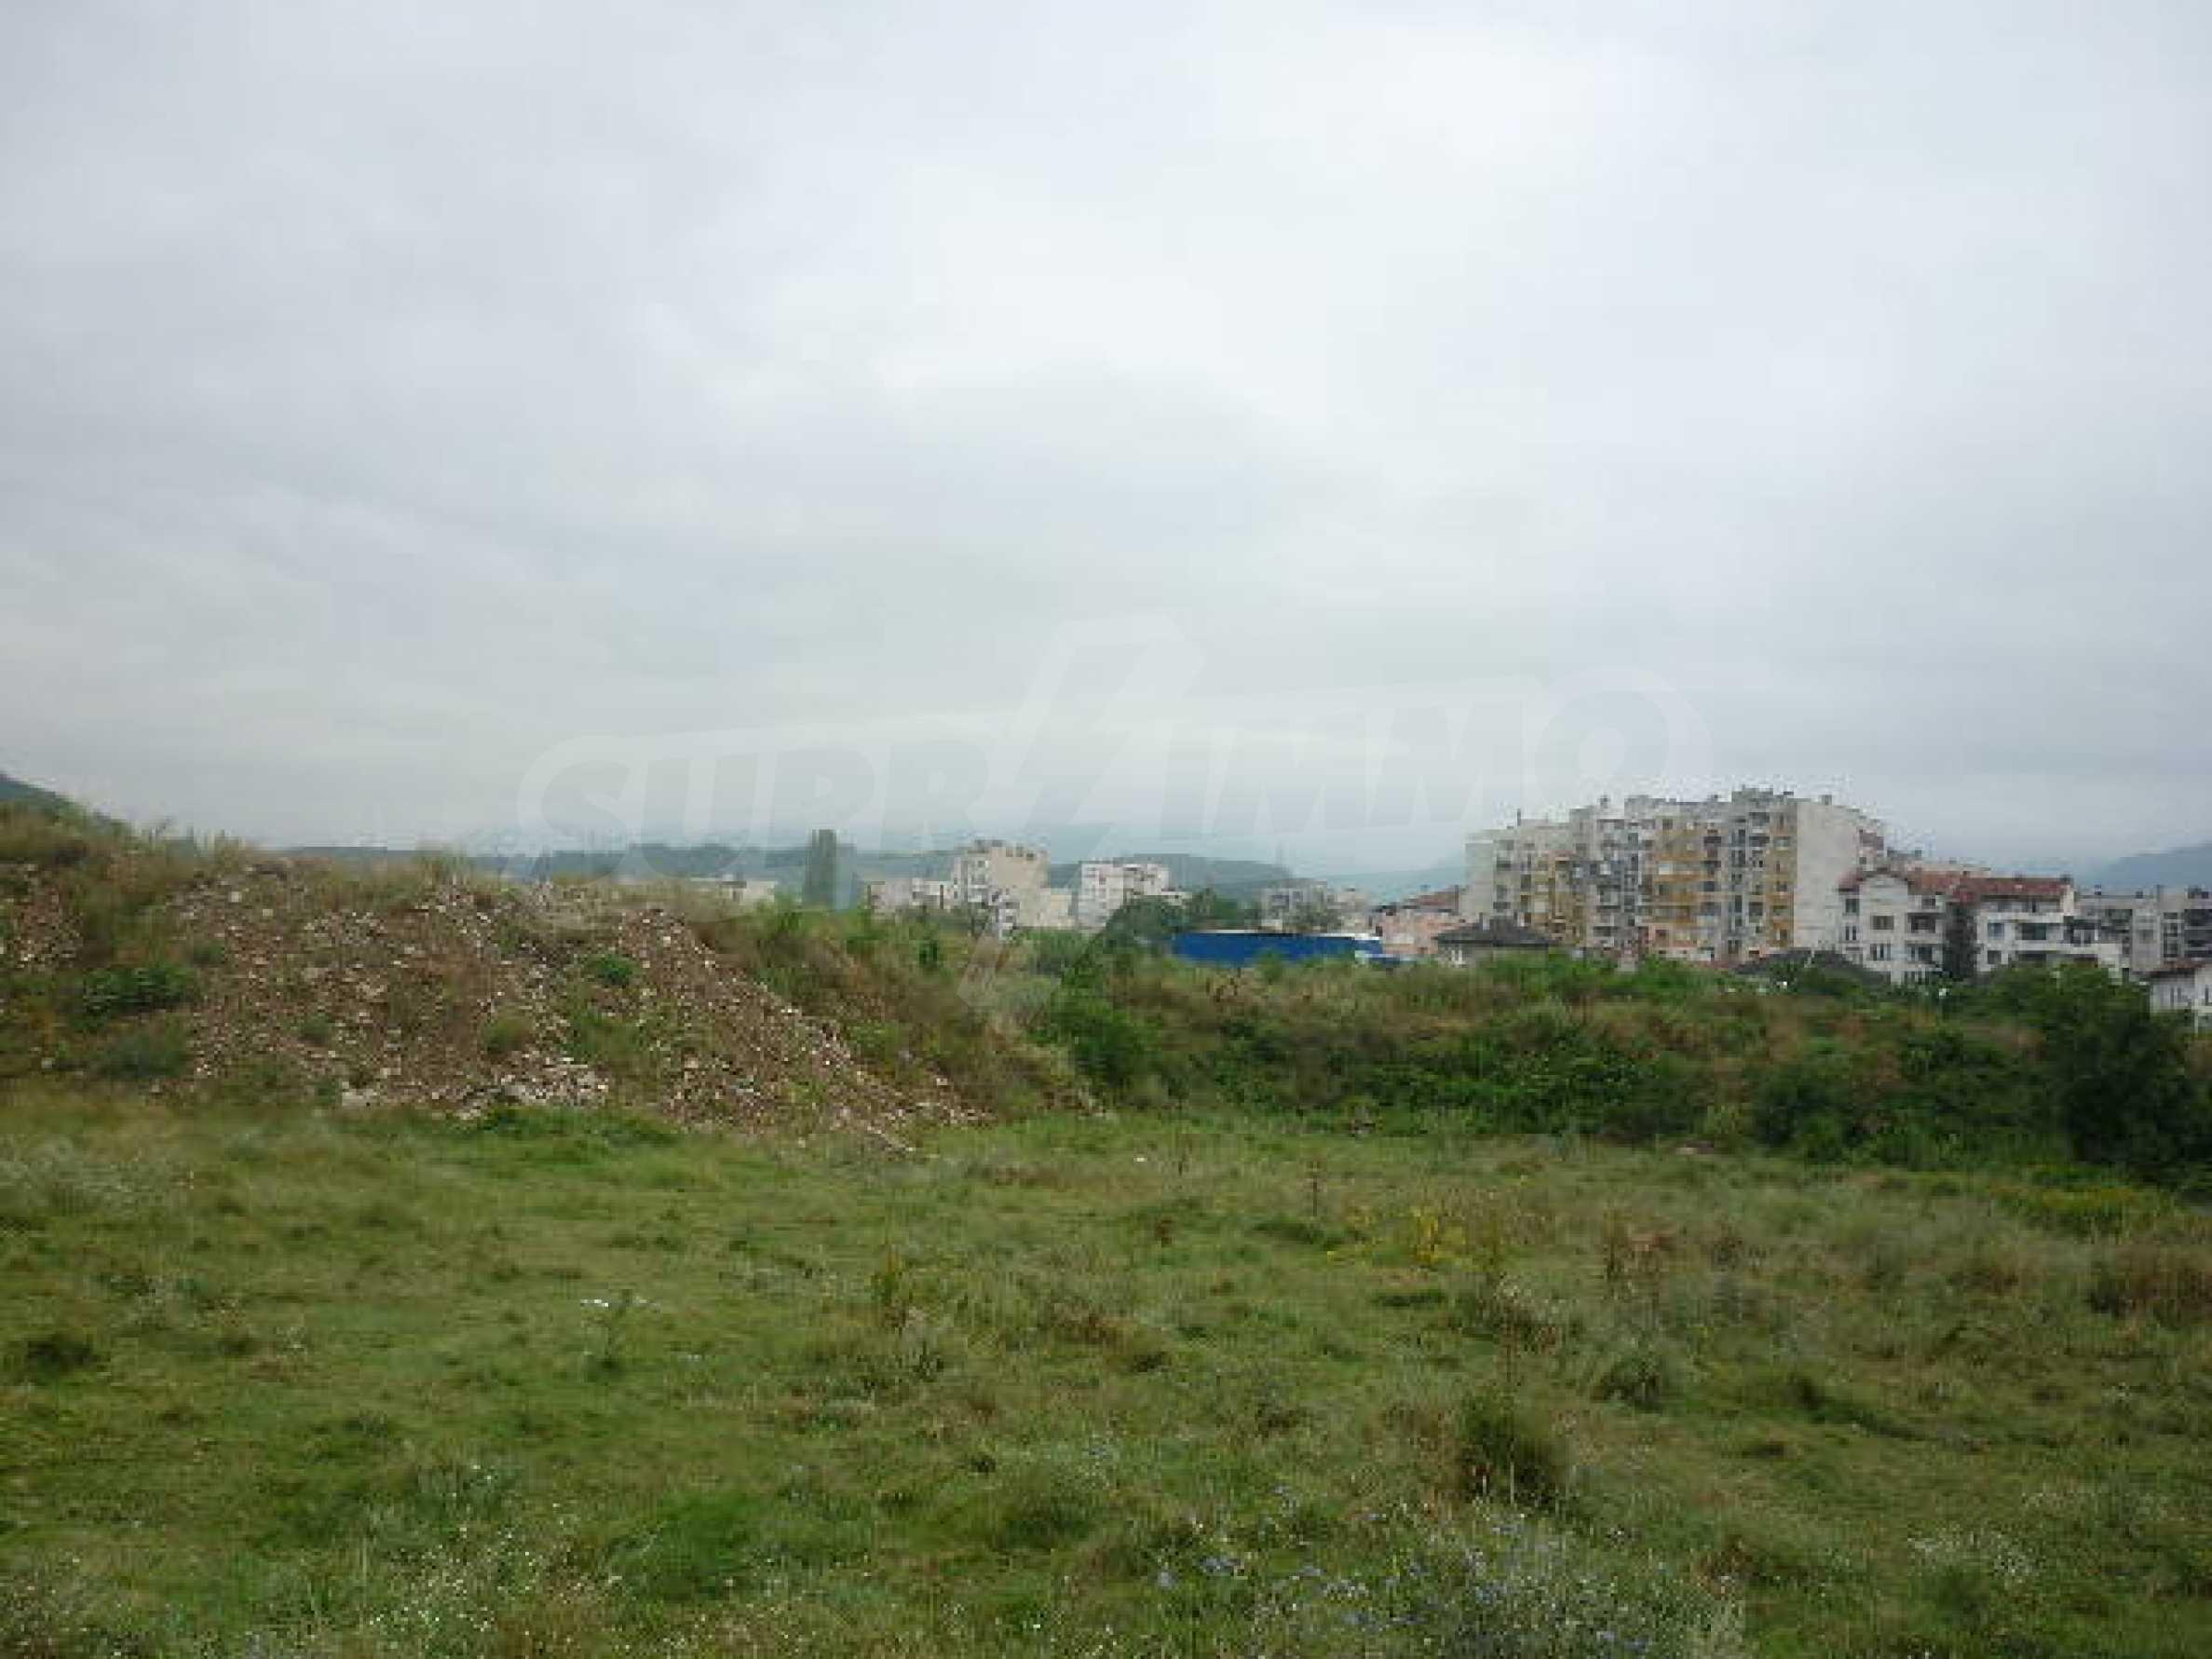 Large plot of land suitable for development 6